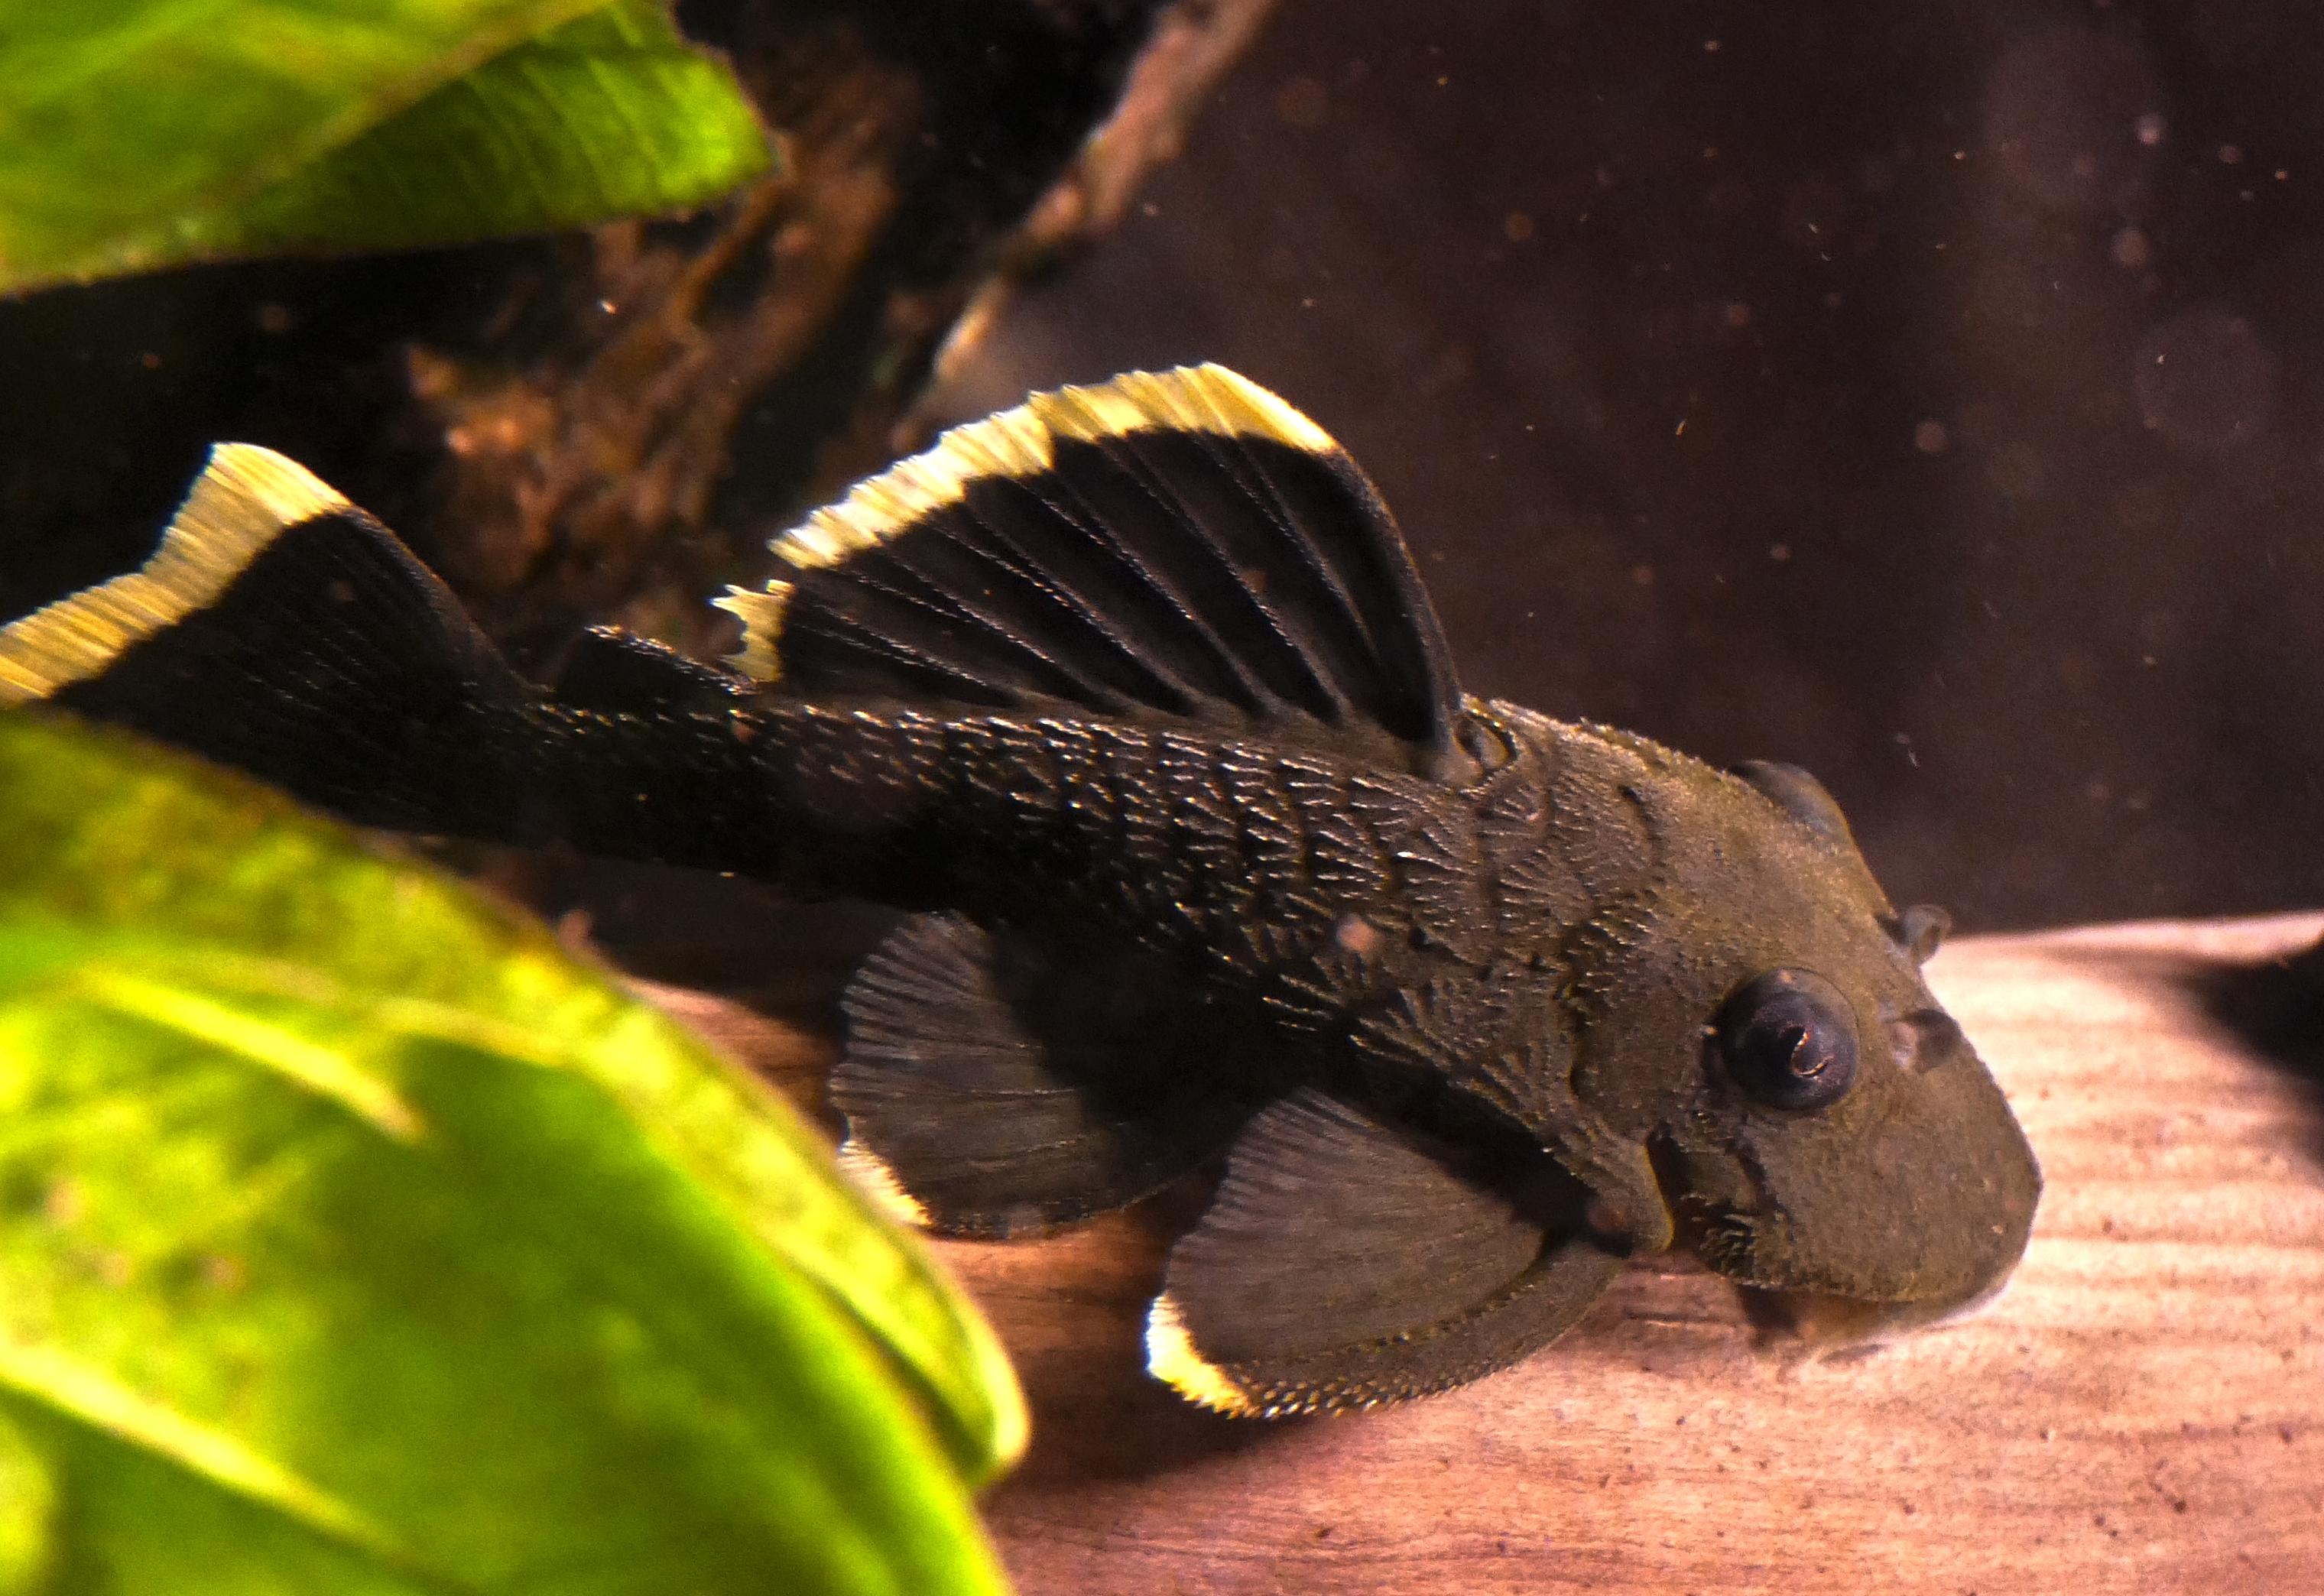 File:Baryancistrus chrysolomus L-047 (2).jpg - Wikimedia Commons